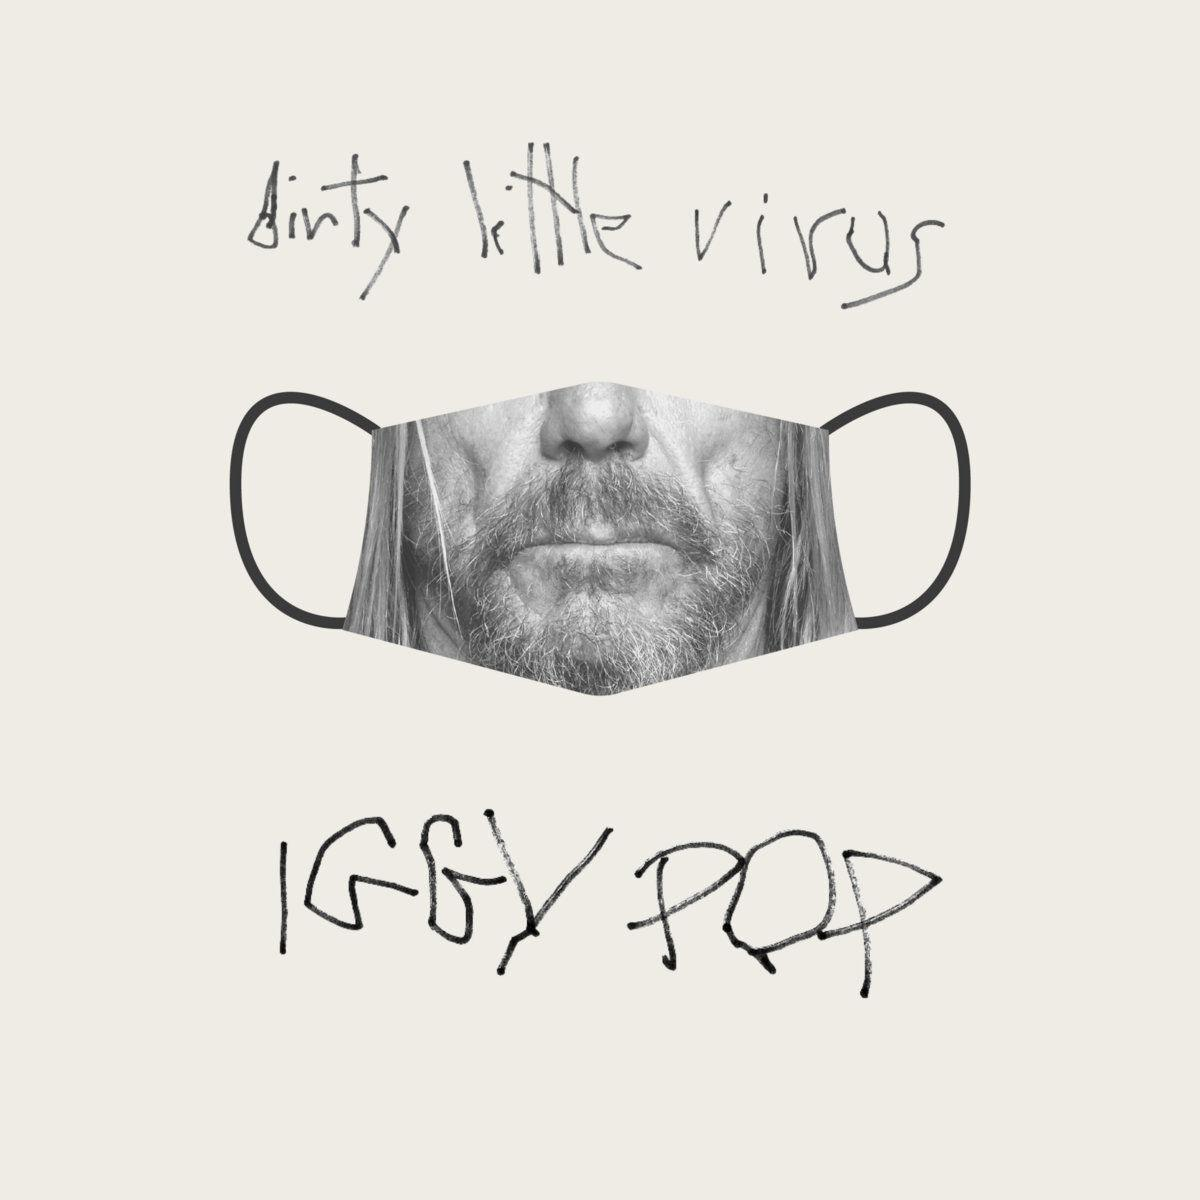 Dirty Little Virus